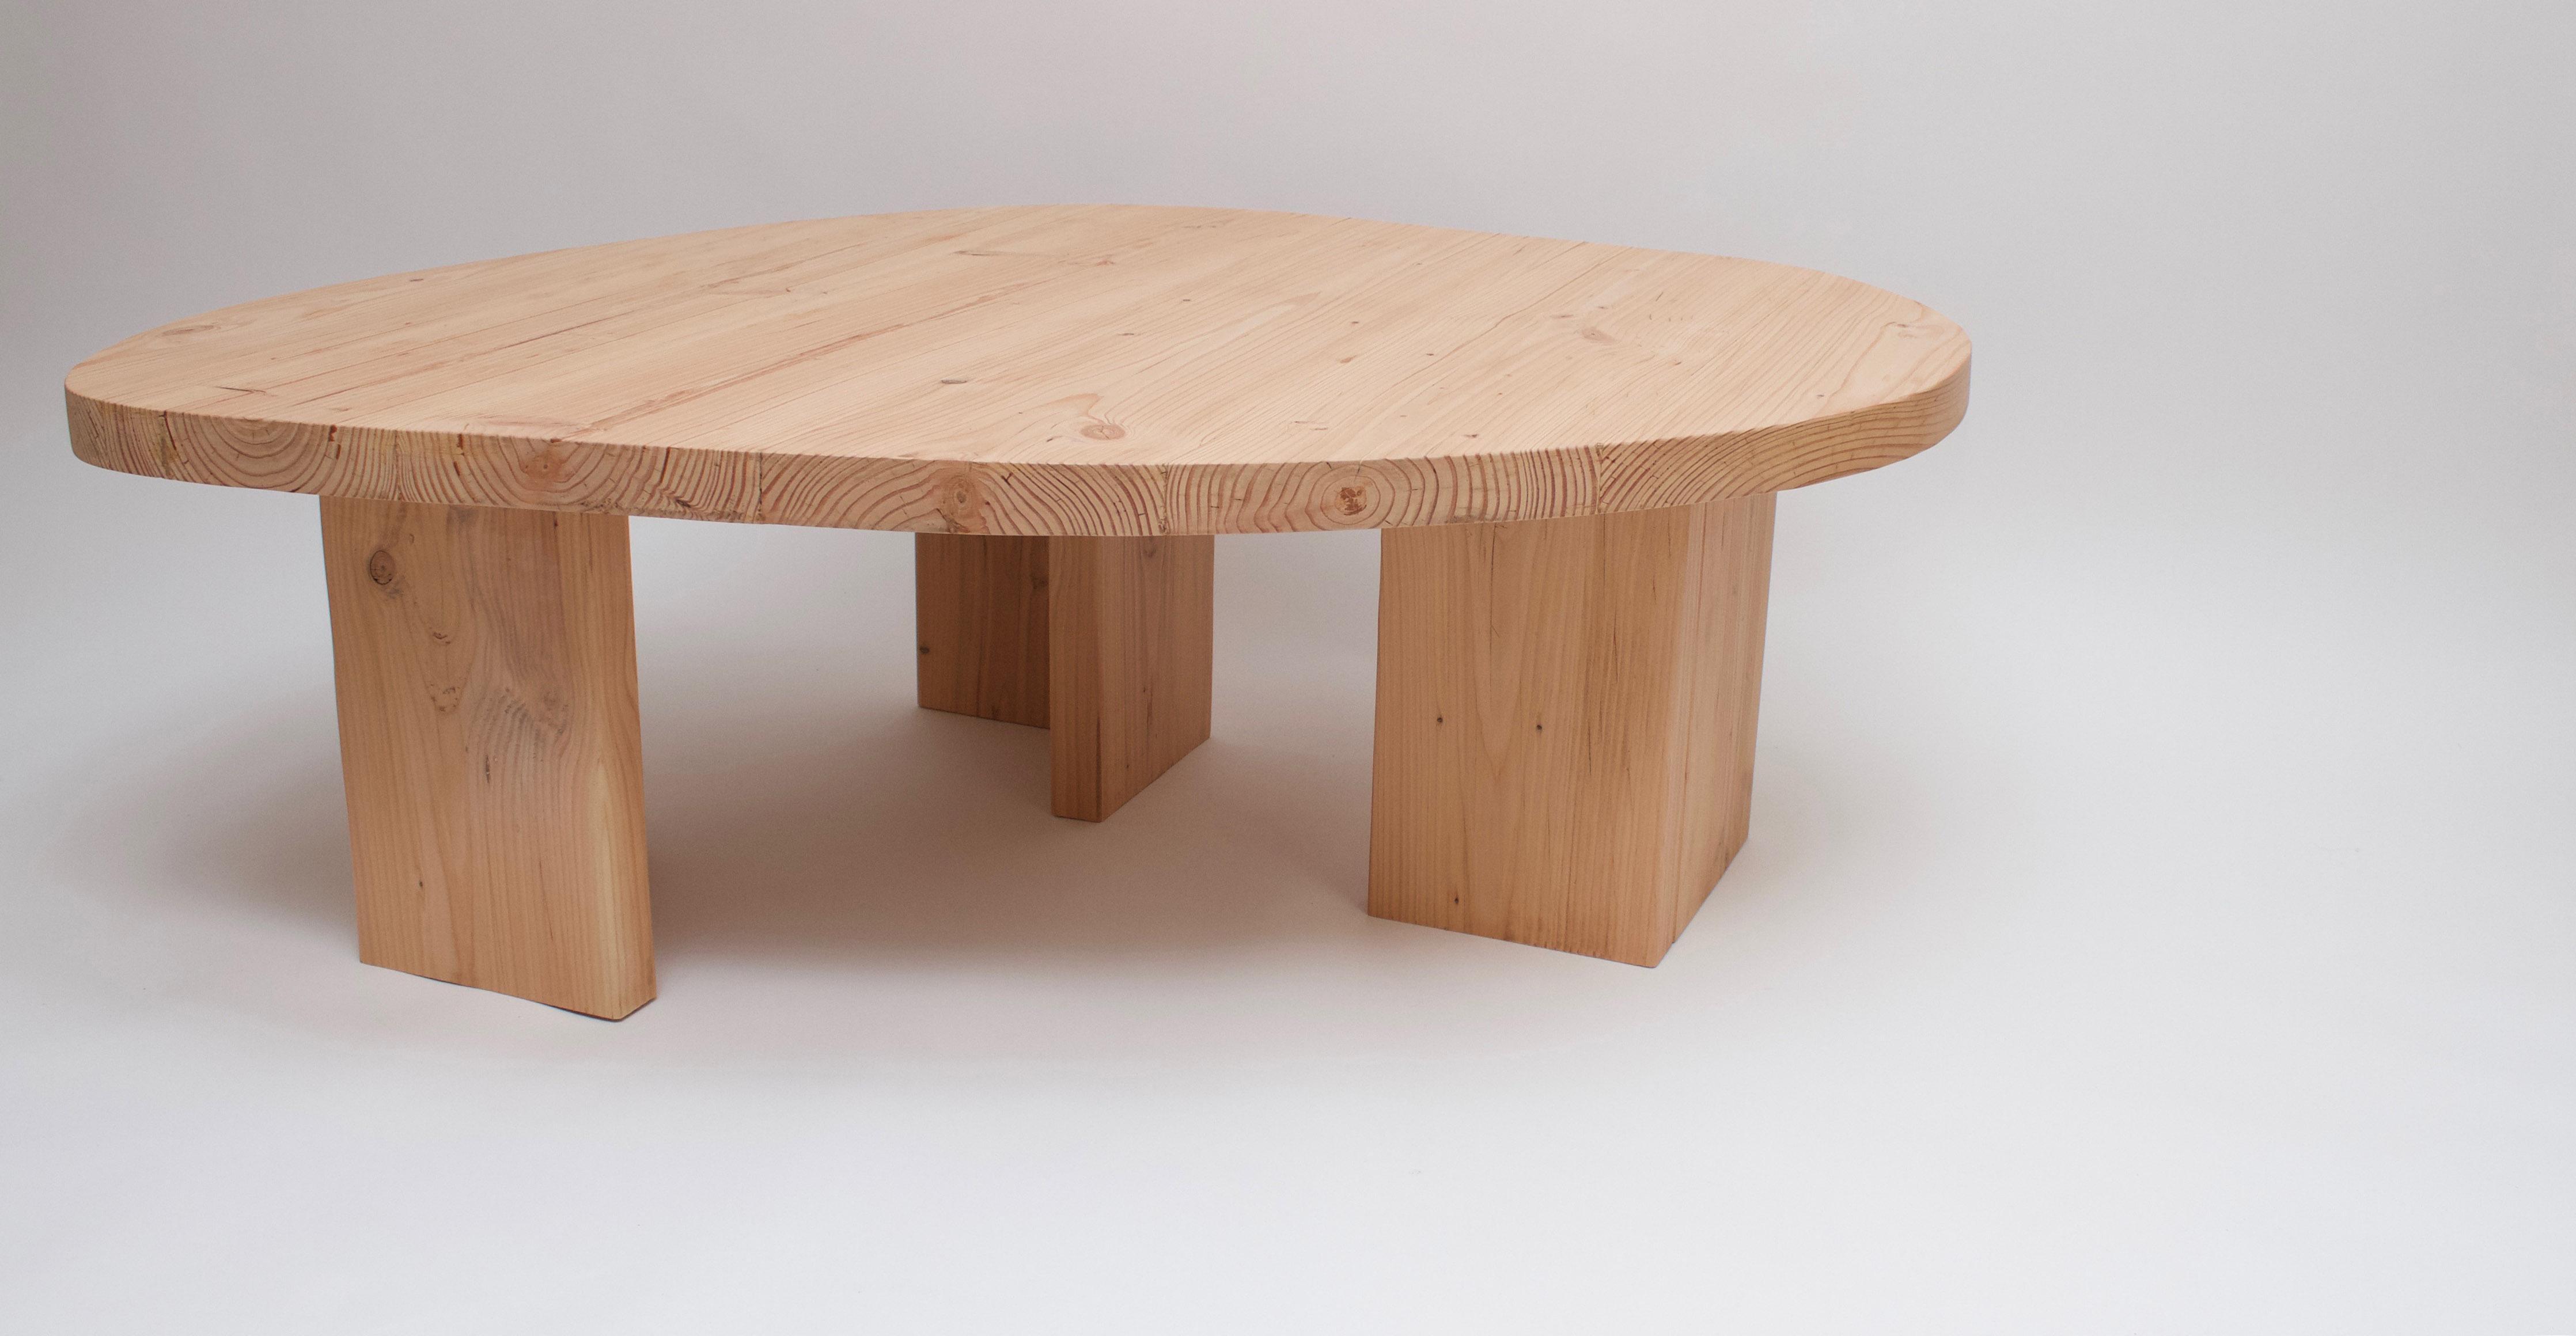 woodaucarre - table easy